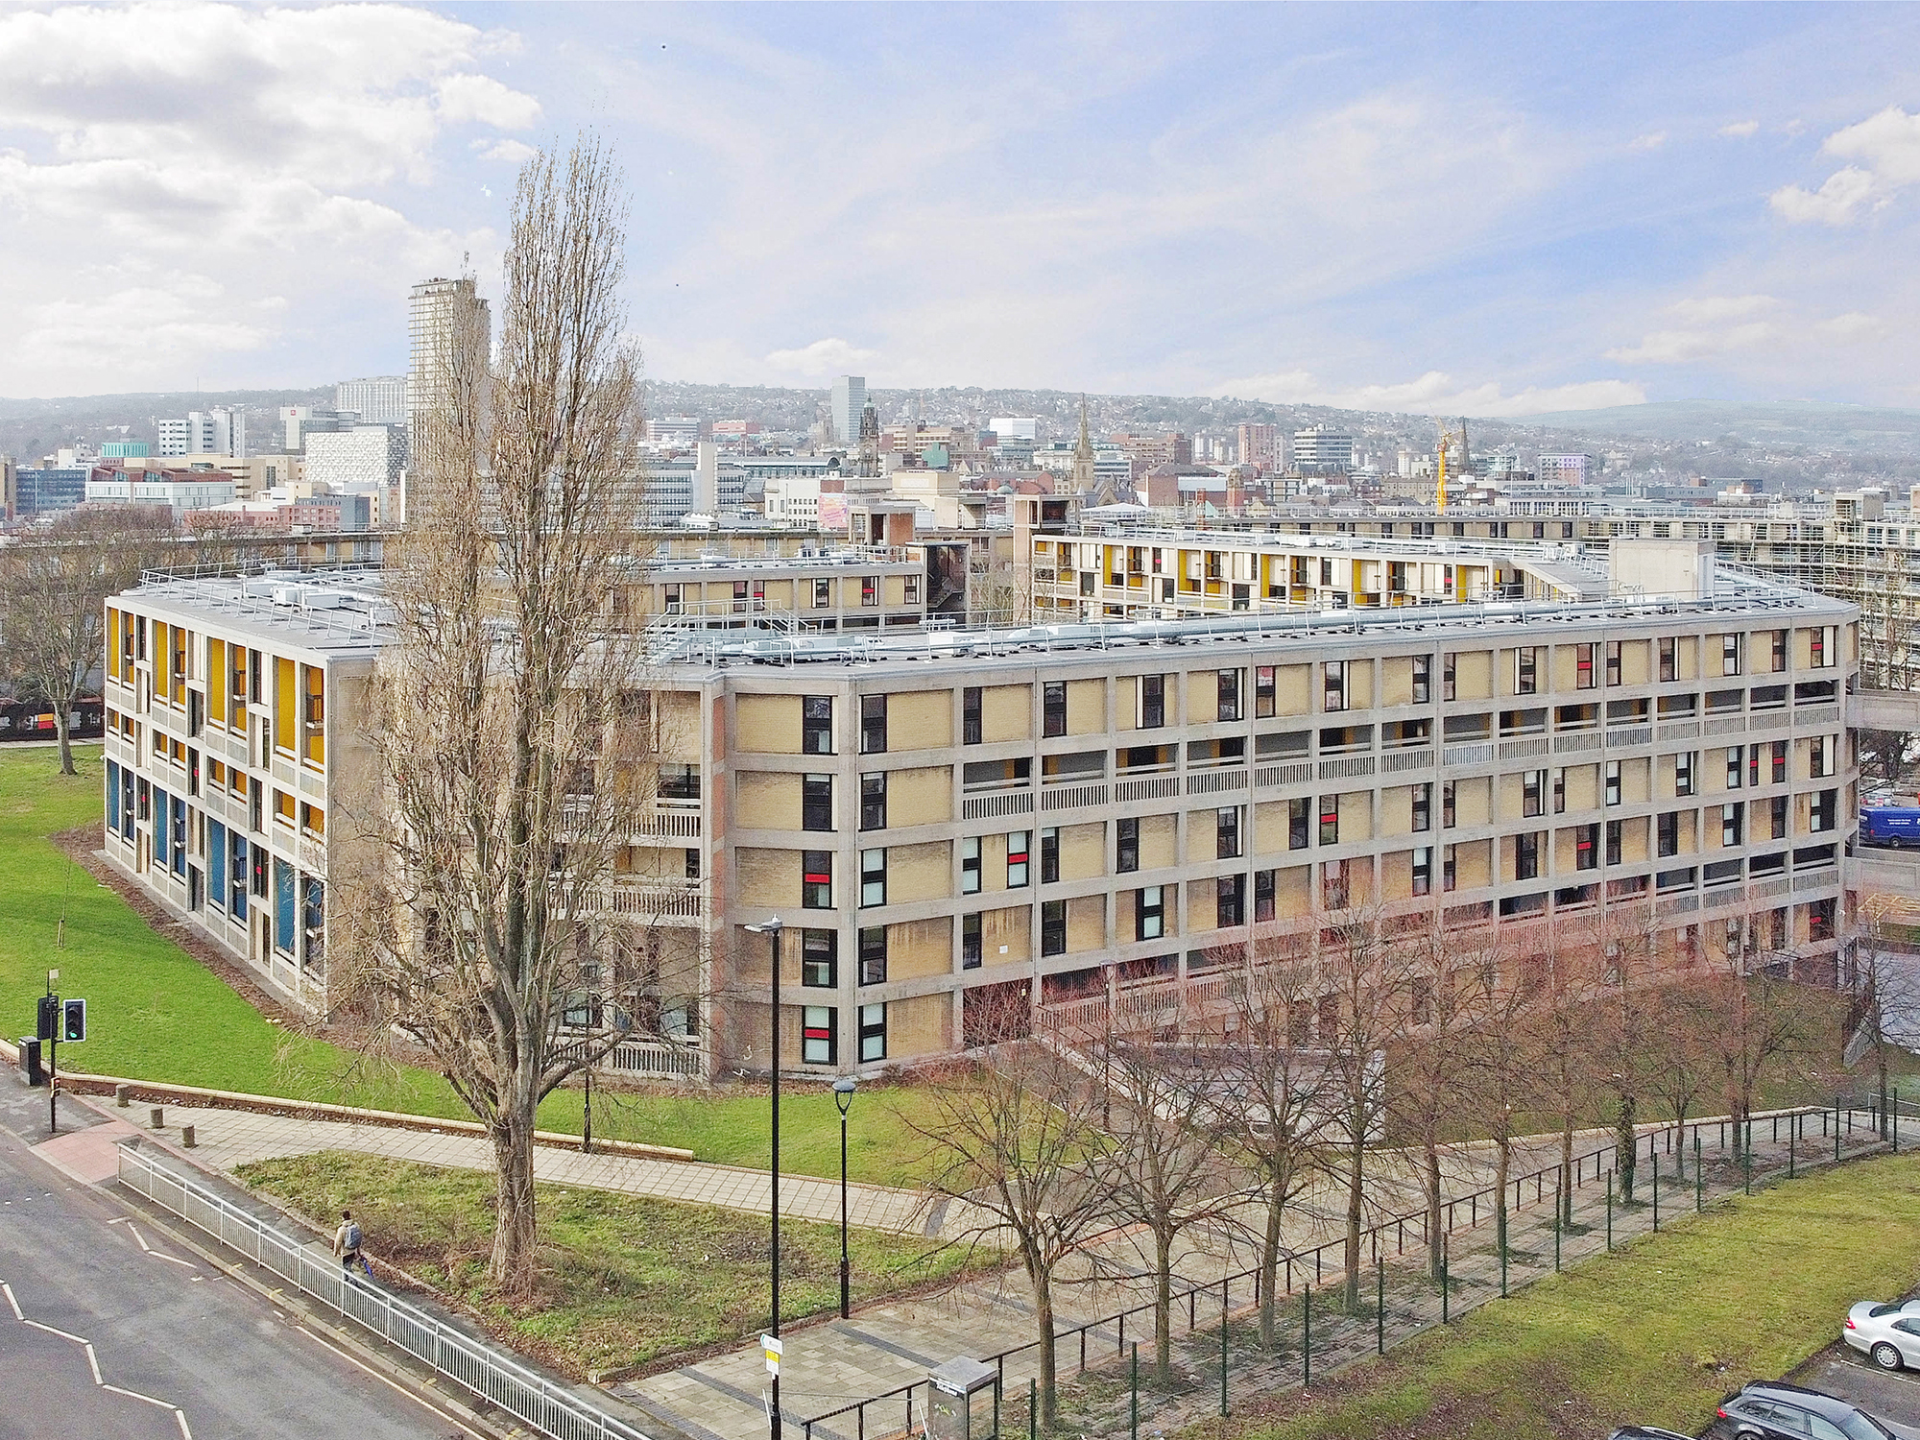 Beton House Drone shot exterior student accommodation